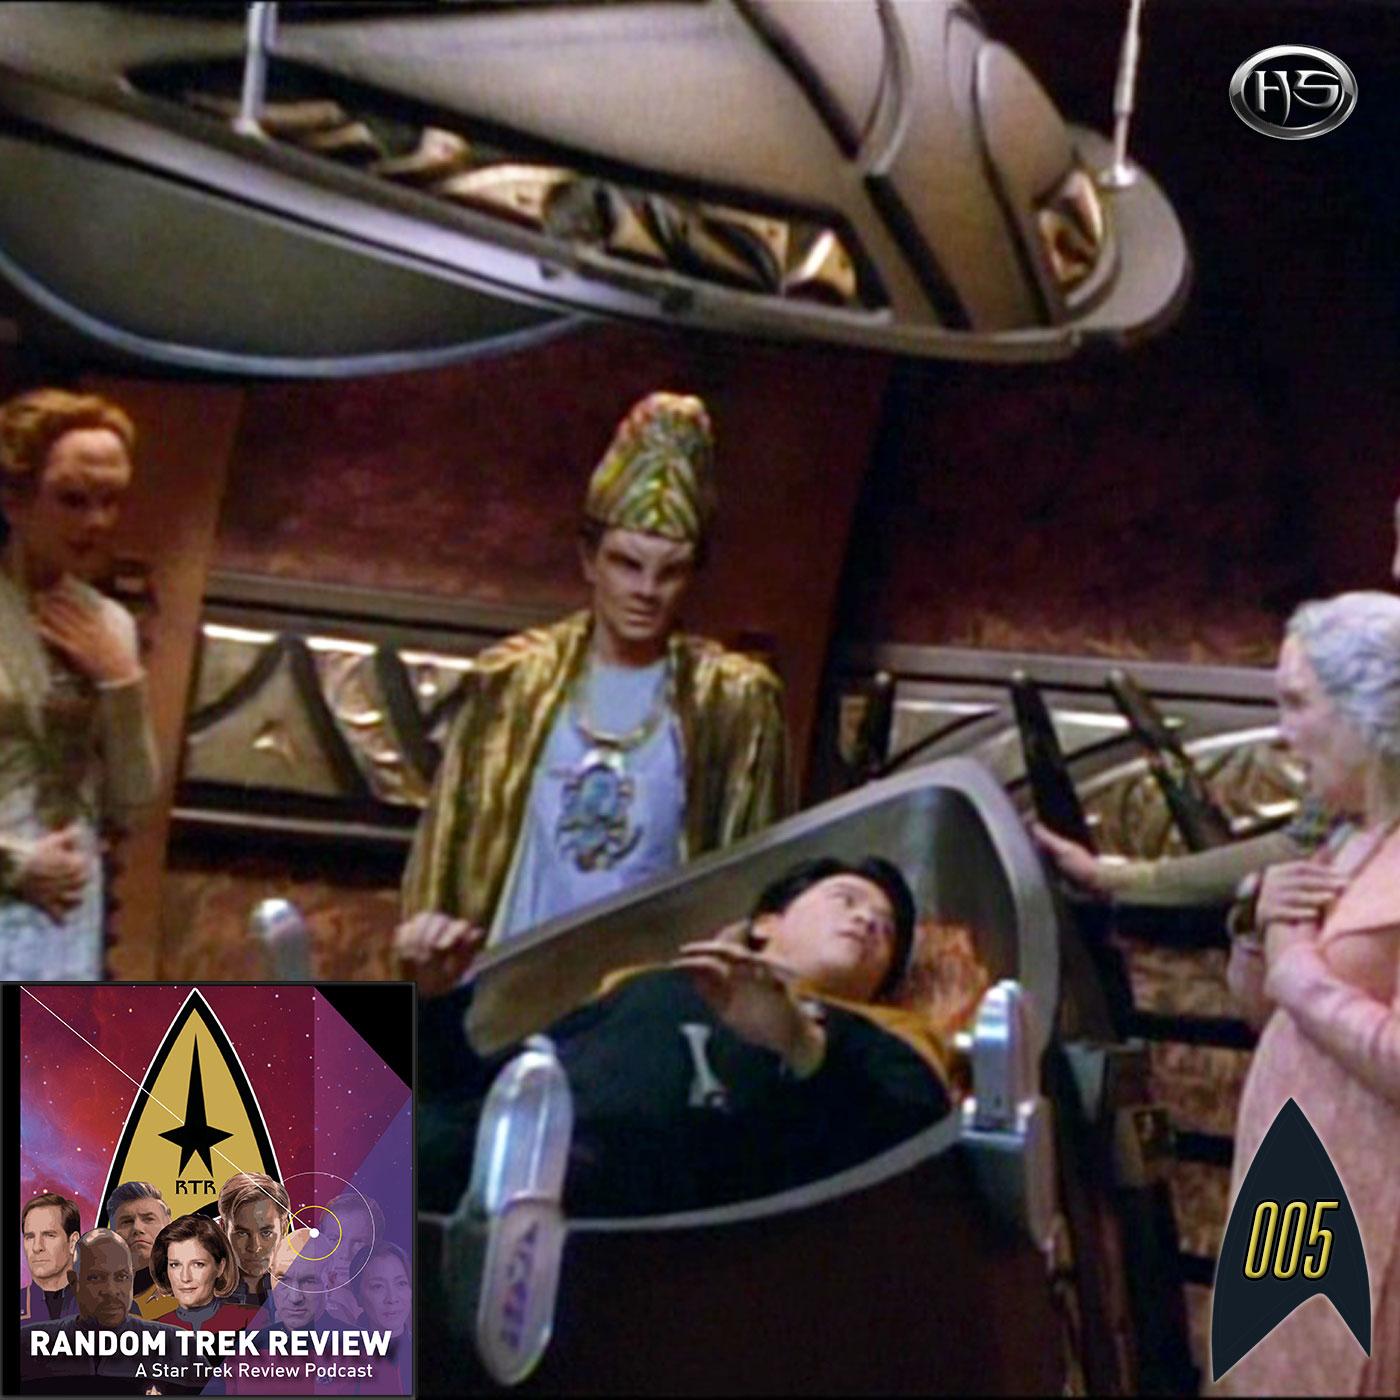 Random Trek Review Episode 5